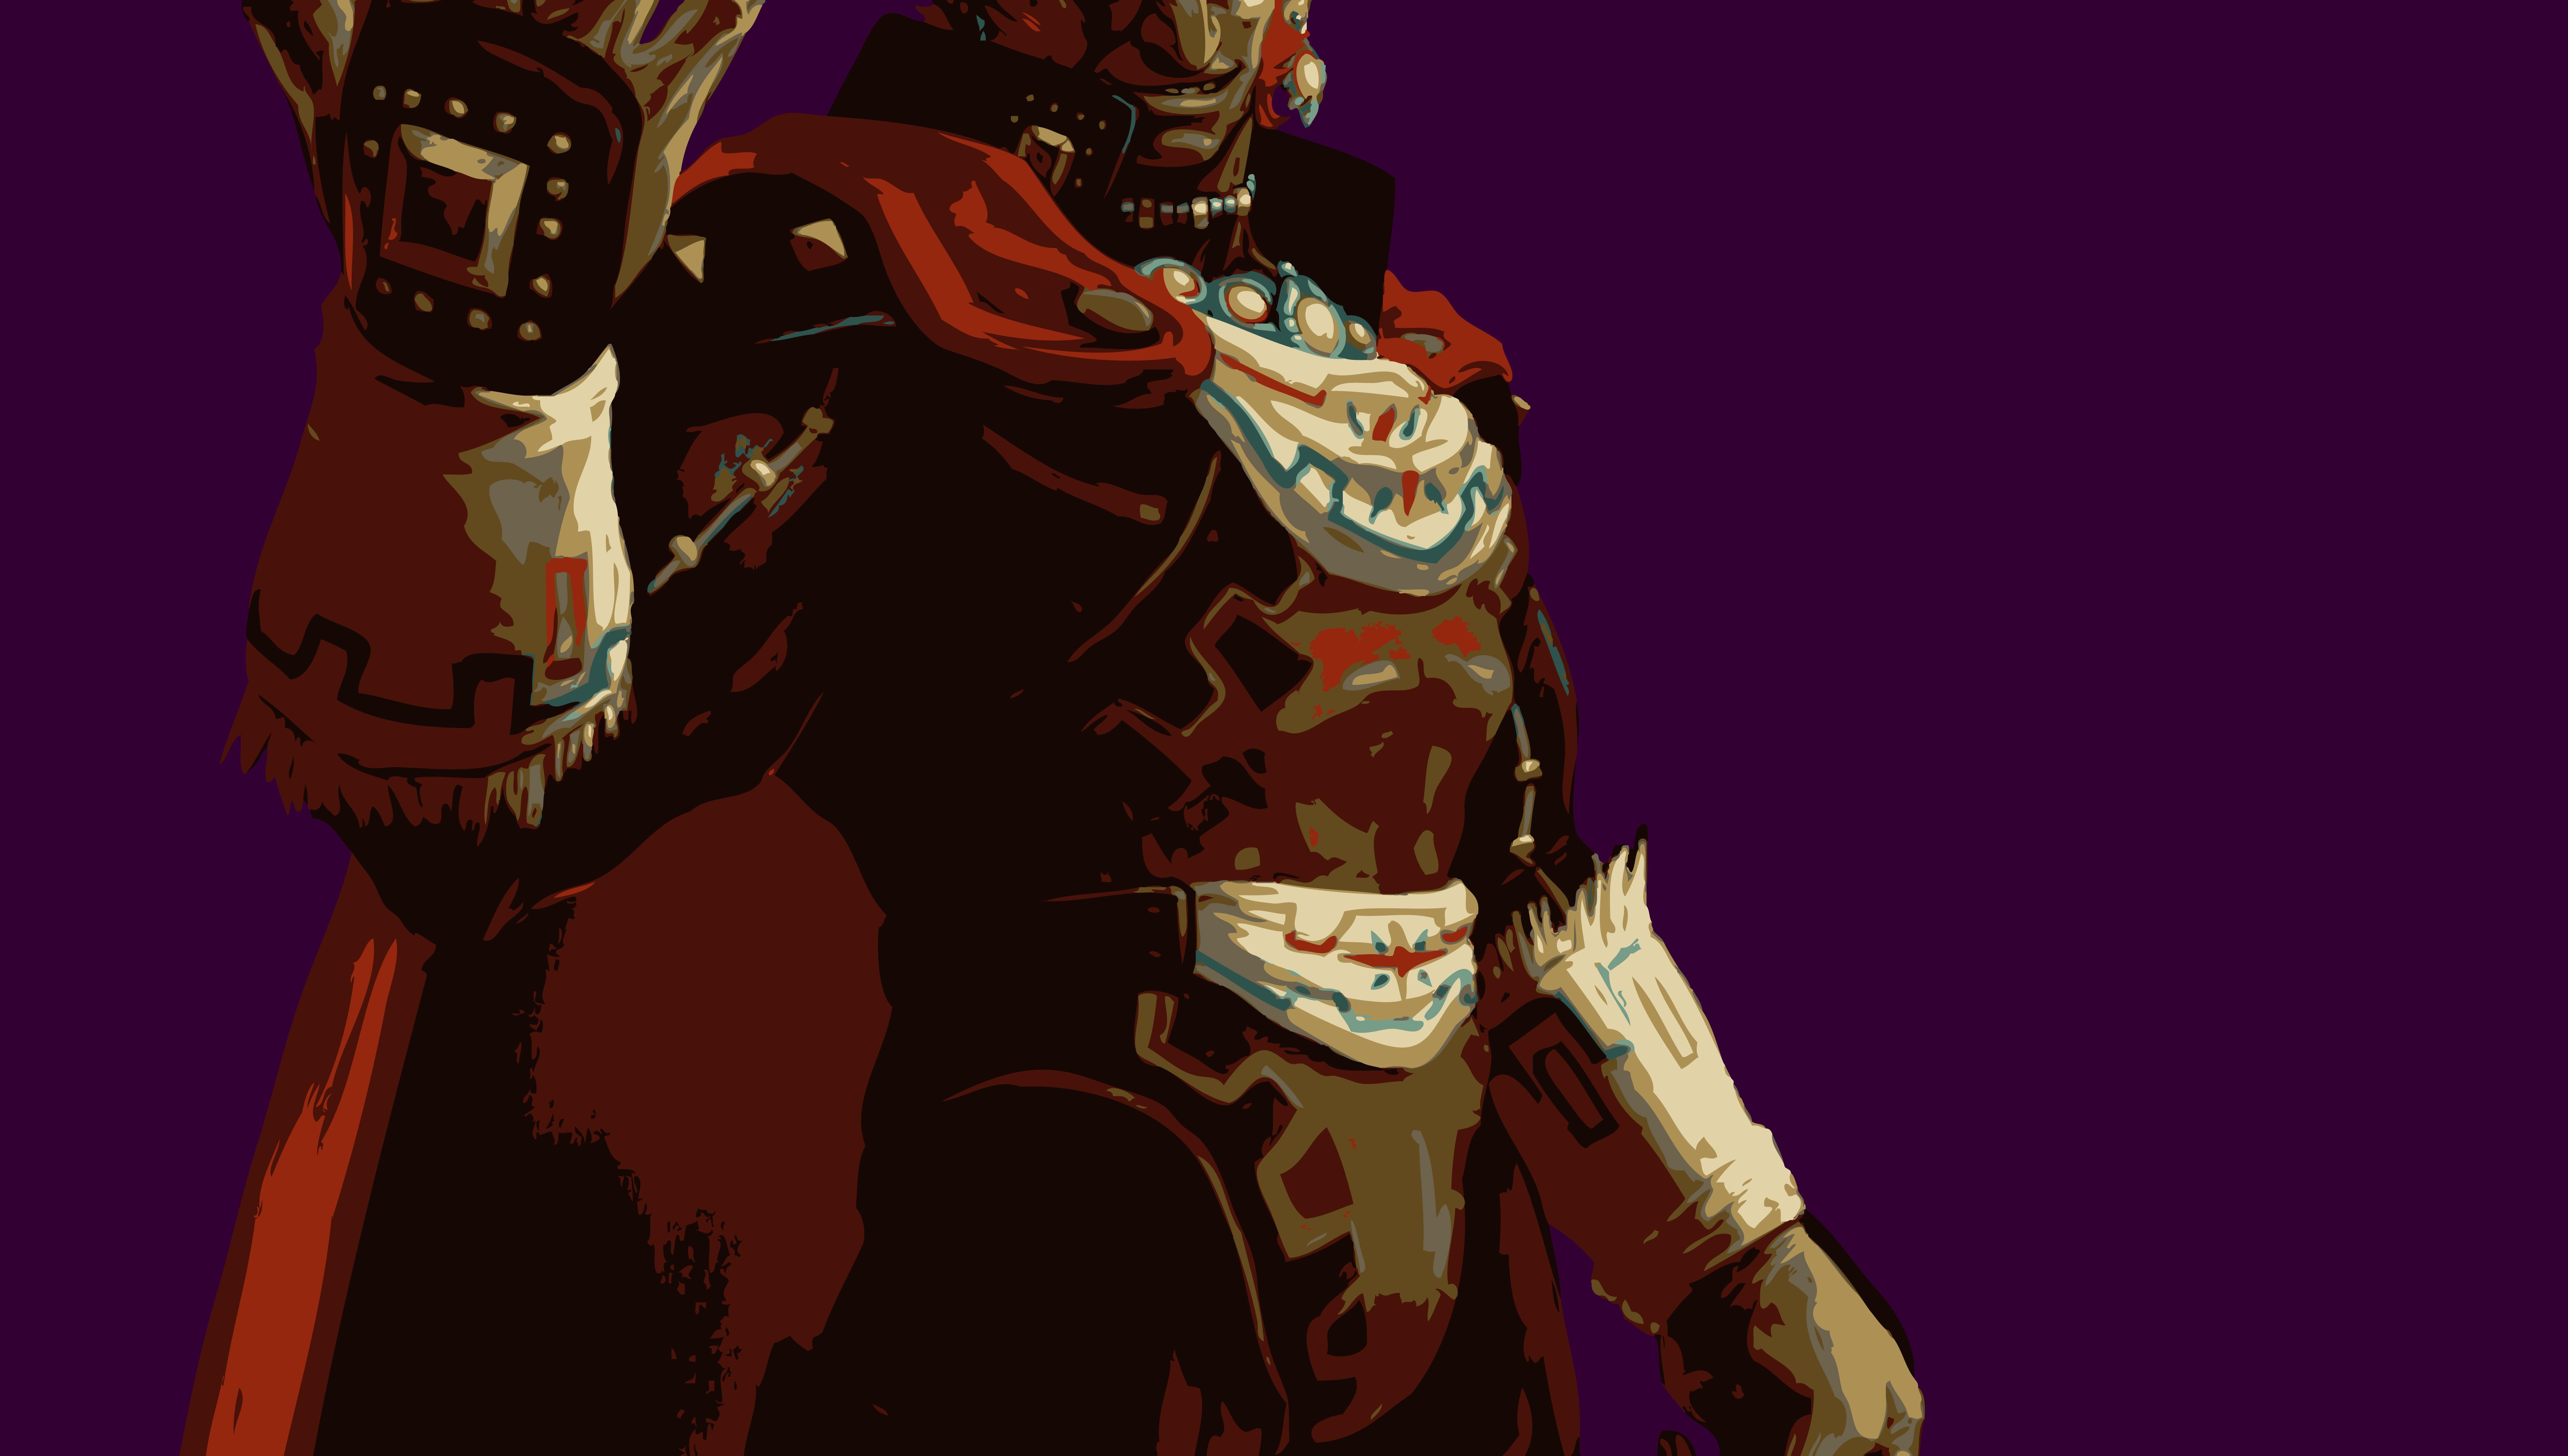 Illustration Video Games Person Ganondorf Screenshot Fictional Character Comic Book Profession